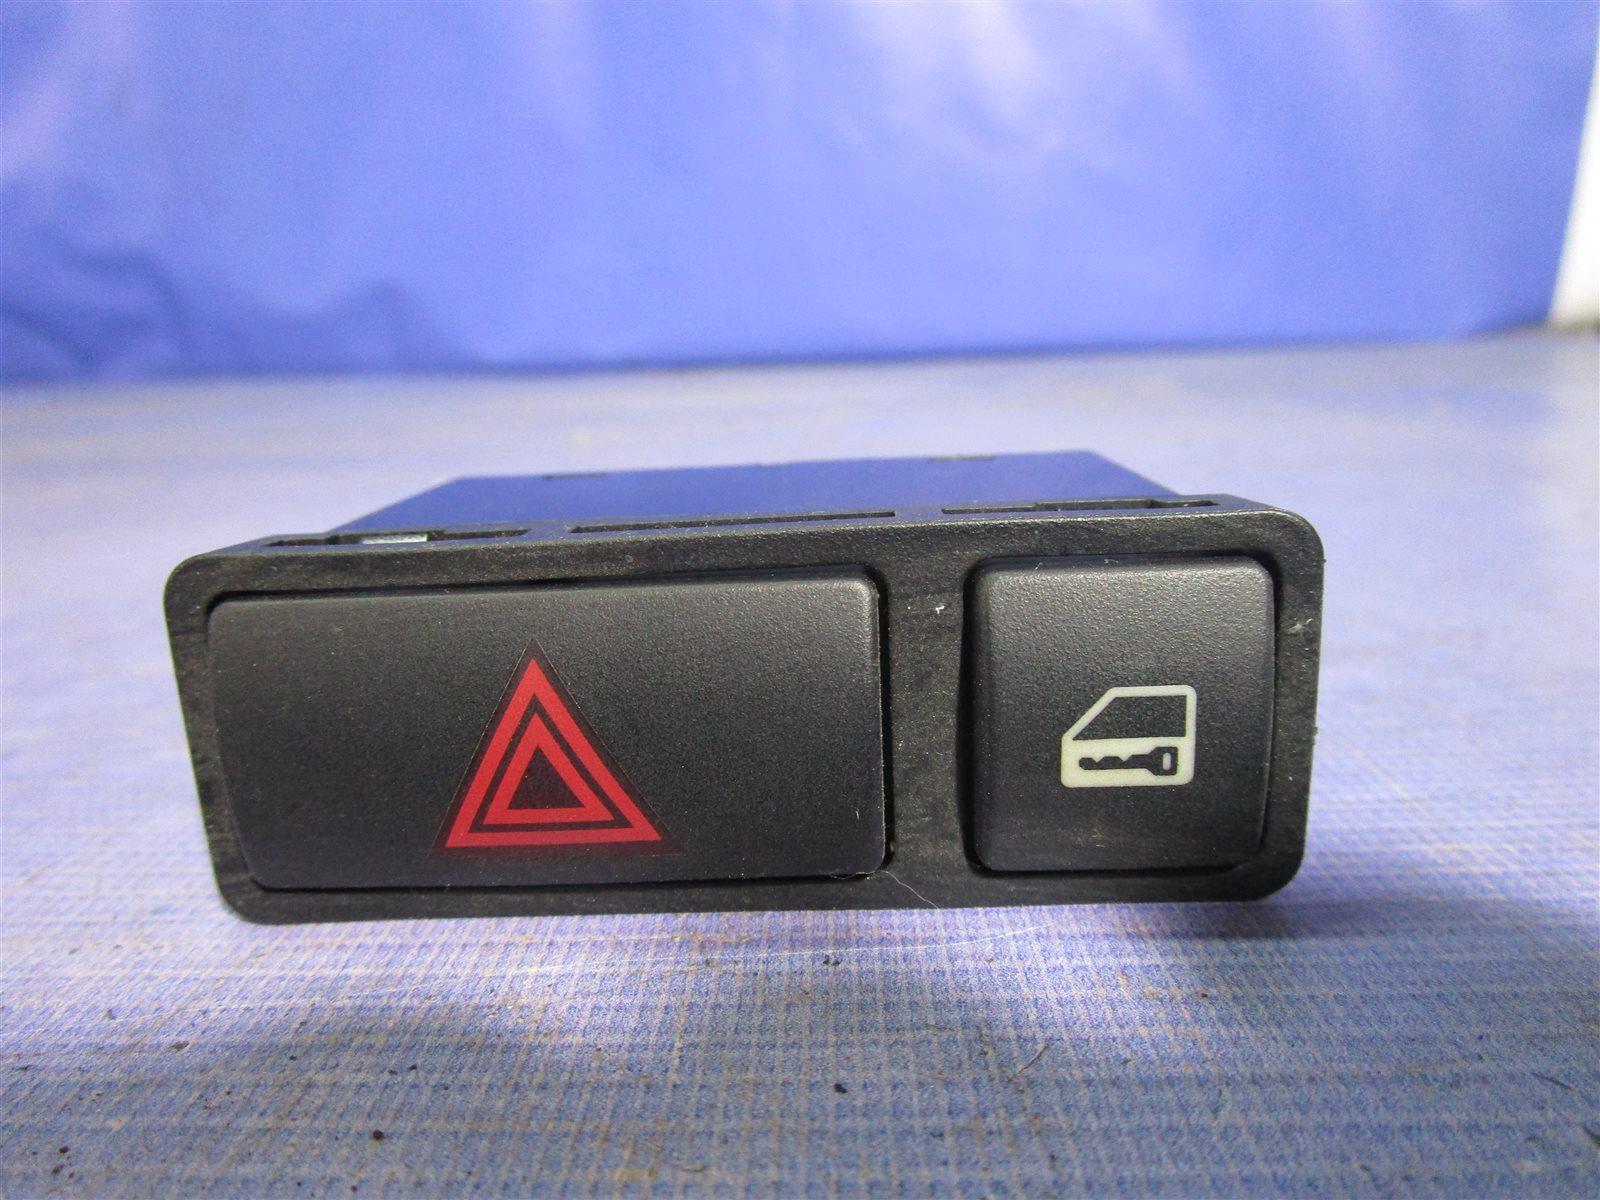 Кнопка аварийной остановки Bmw 3-Series E46 226S1 M54 2002